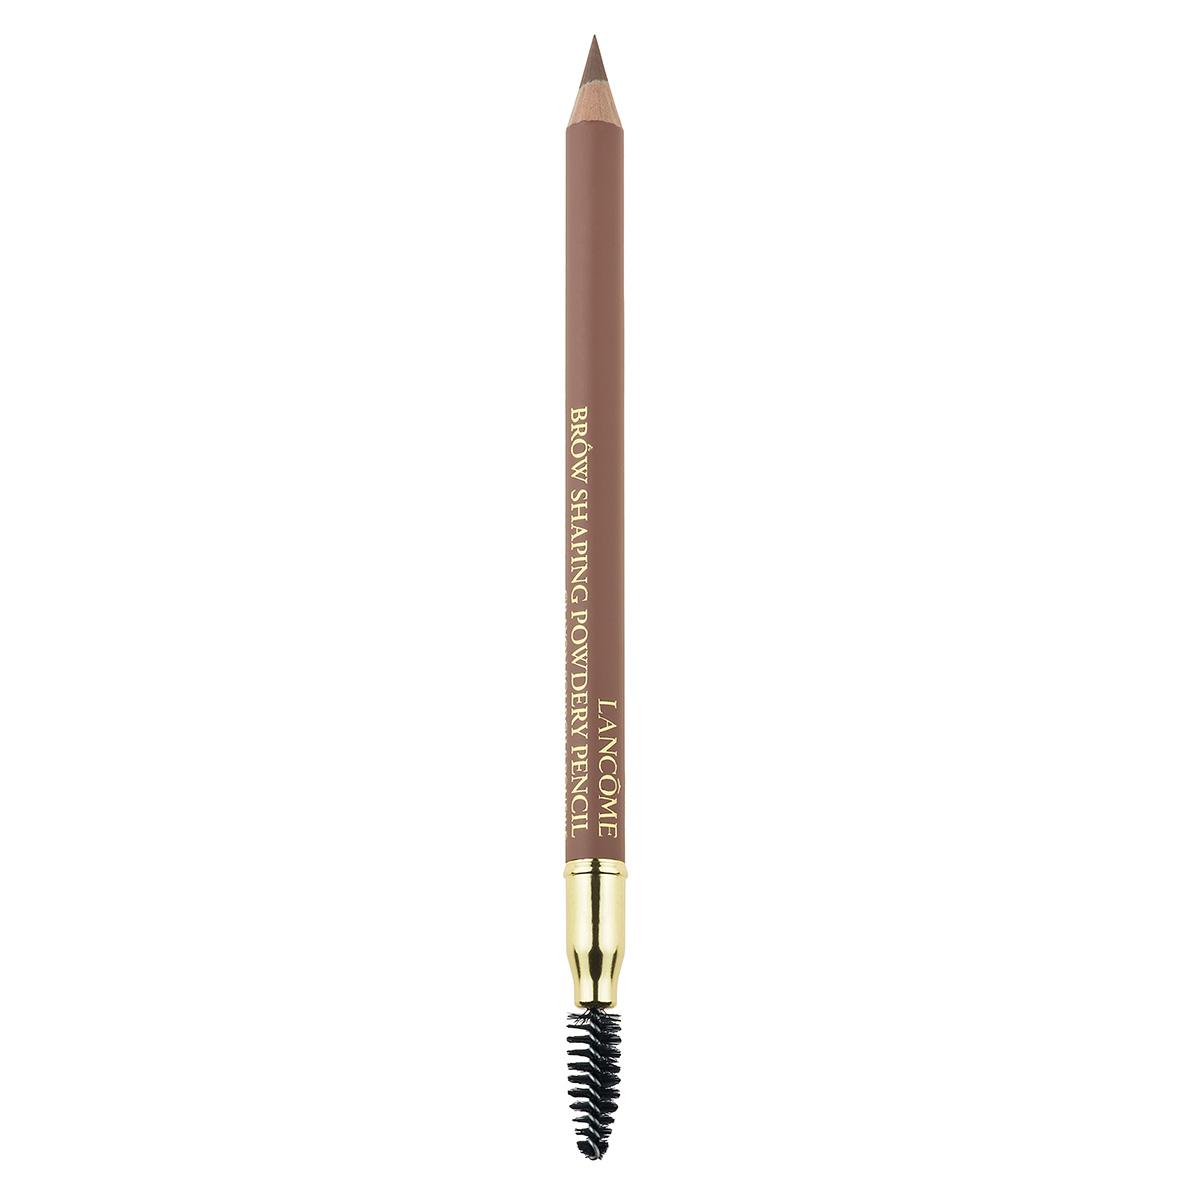 Lancôme - Brôw Shaping Powdery Pencil - Crayon poudre à sourcils